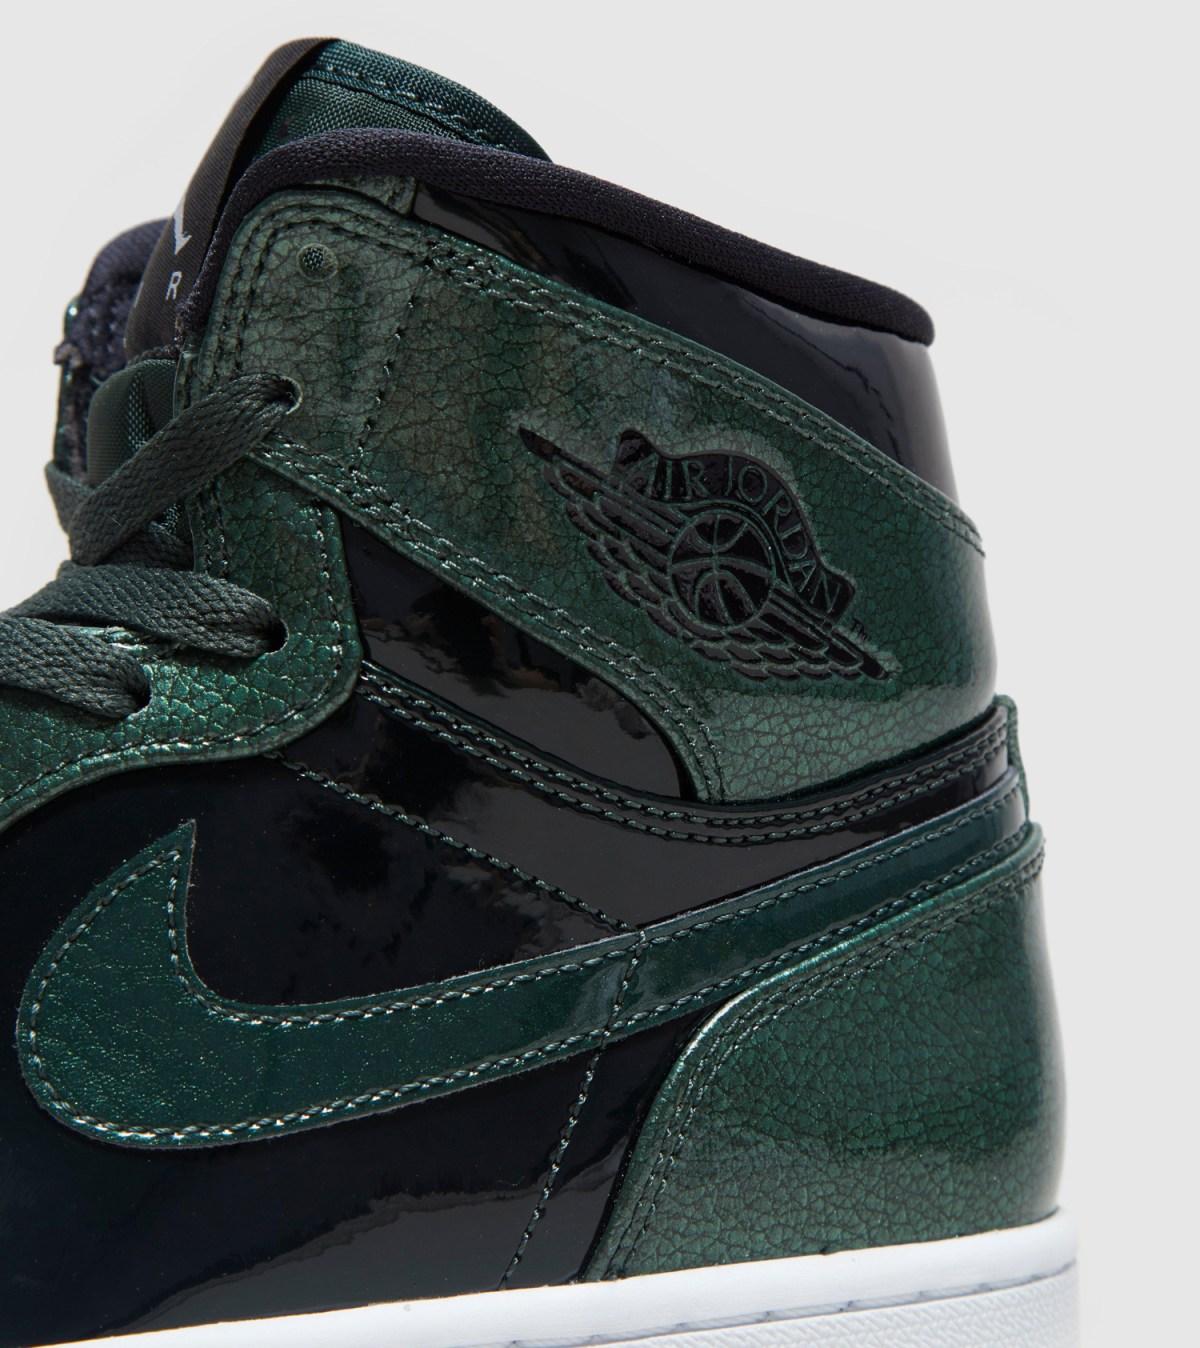 Air Jordan 1 Gorge Green Patent Leather 332550-300 Back Detail